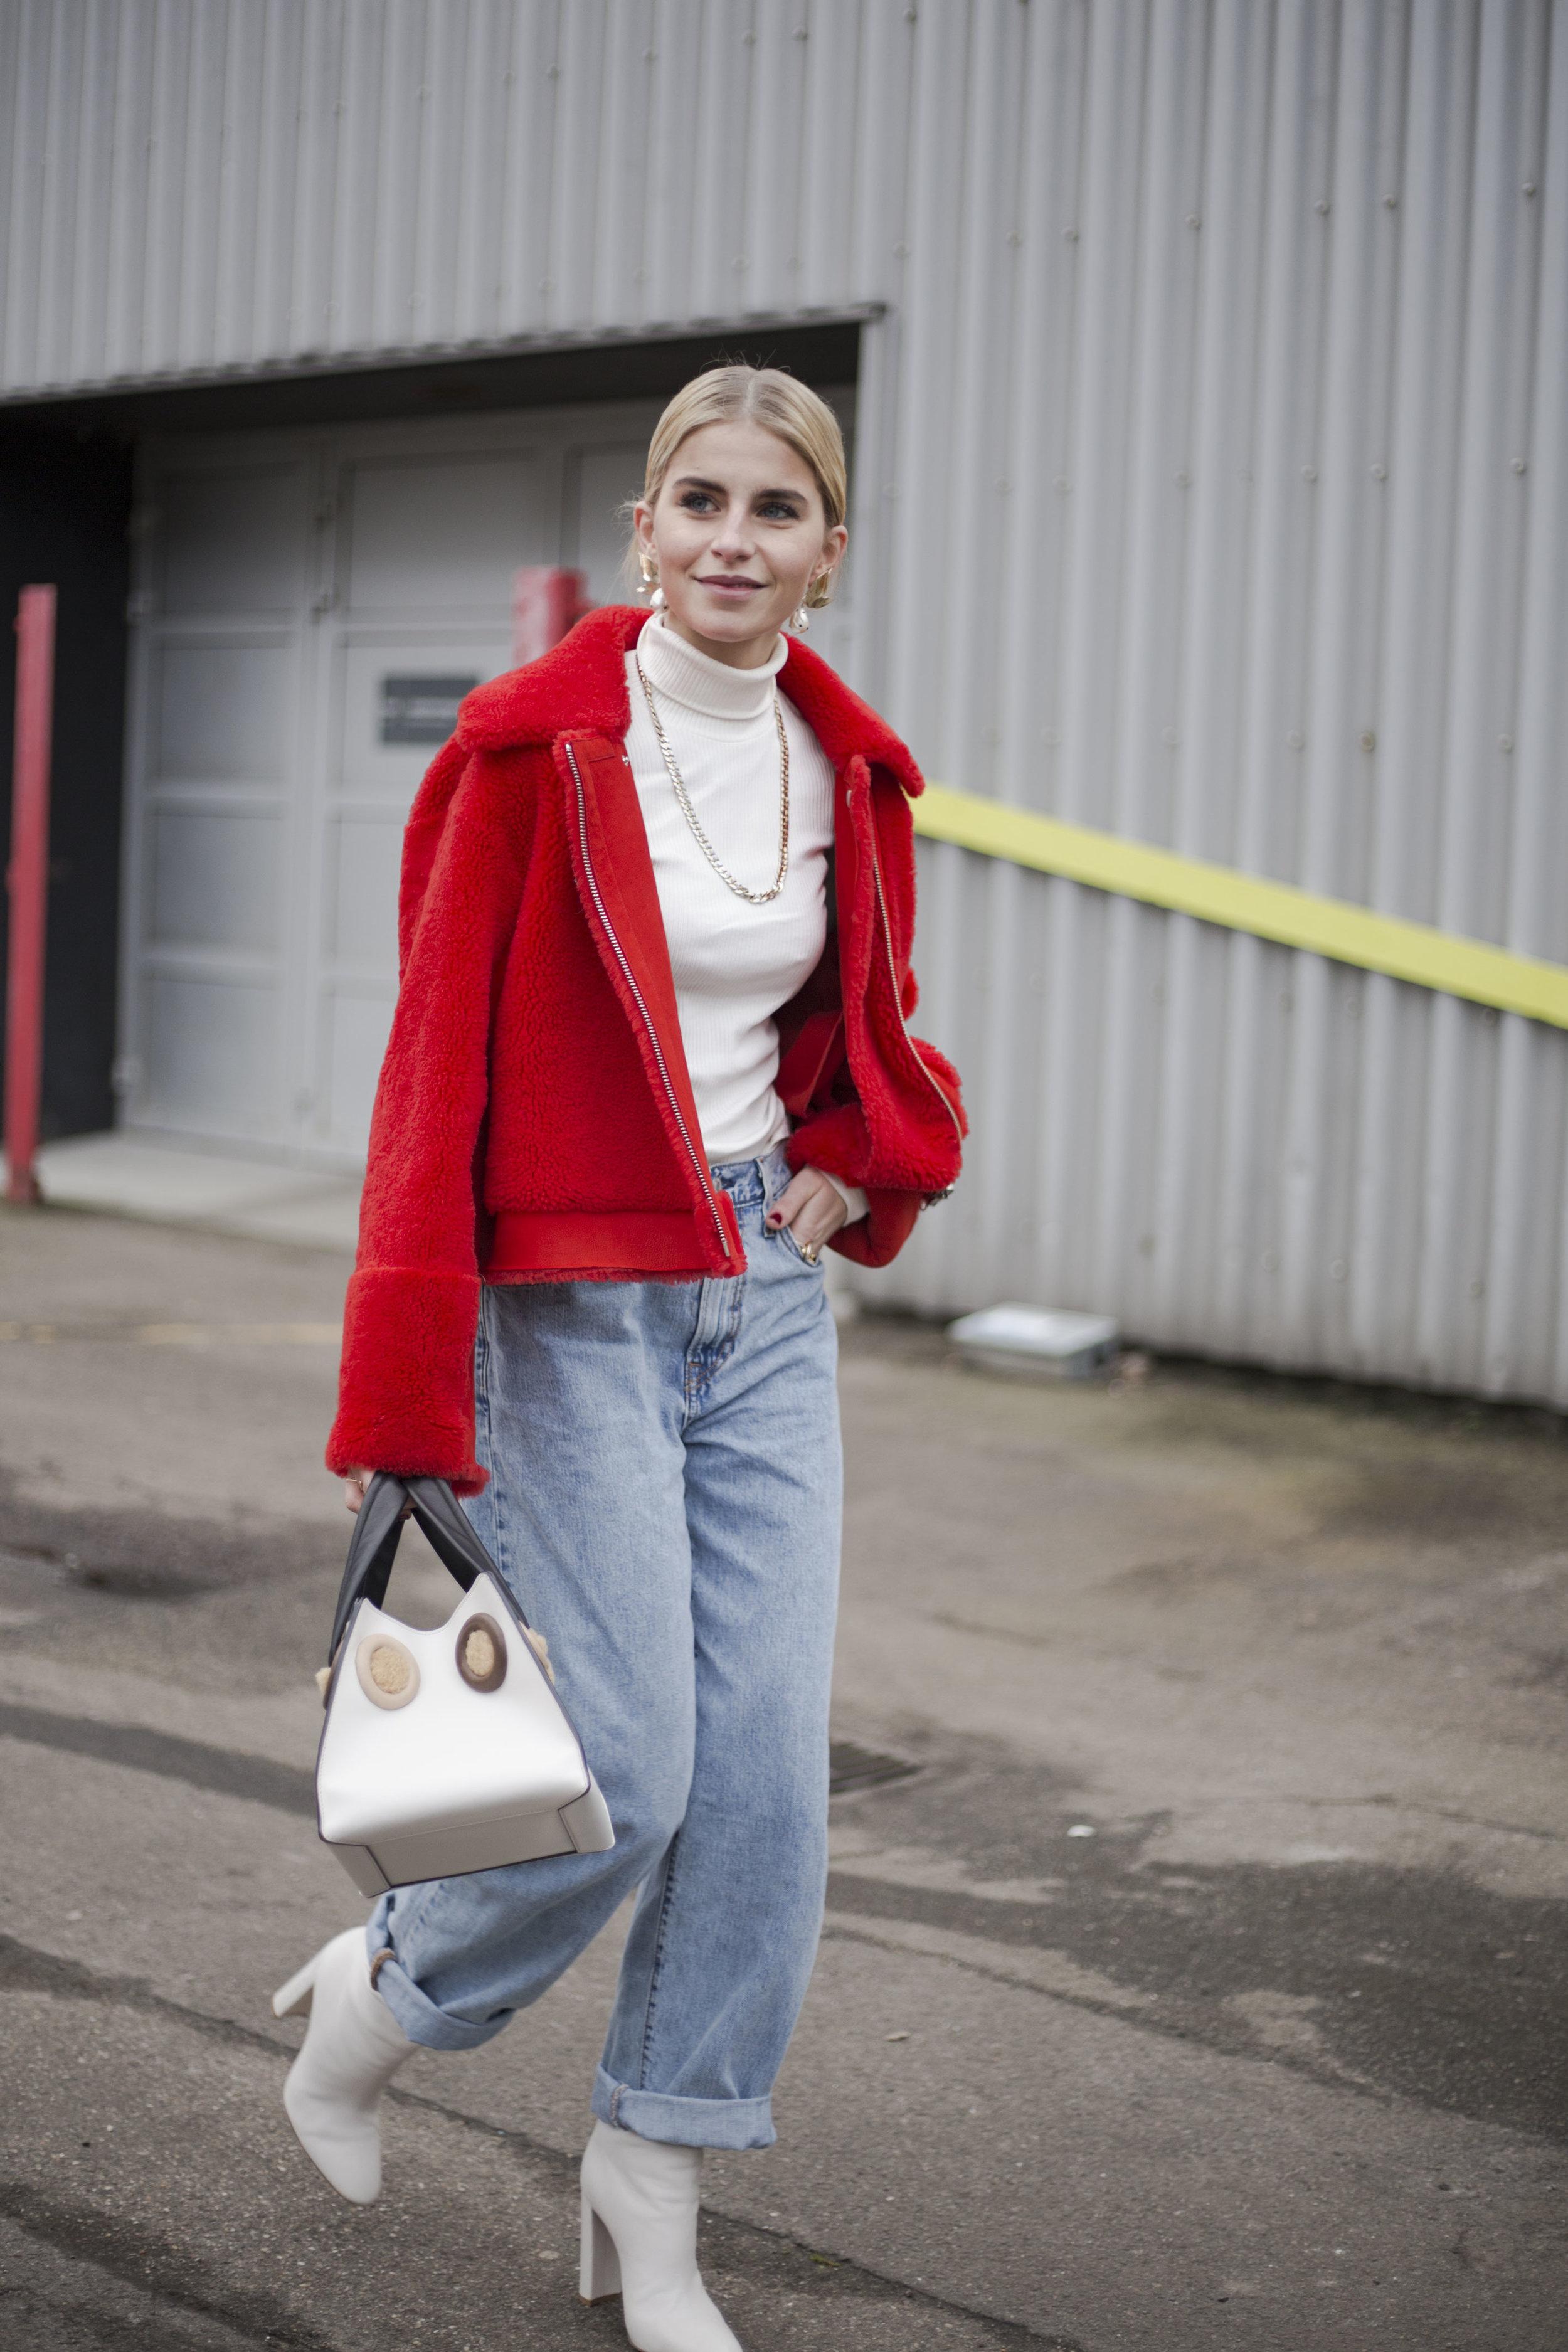 caroline-daur-copenhagen-fashion-week-aw18-scandinavian-street-style-streetstyle-thestreetland-fashion-best-style.jpg